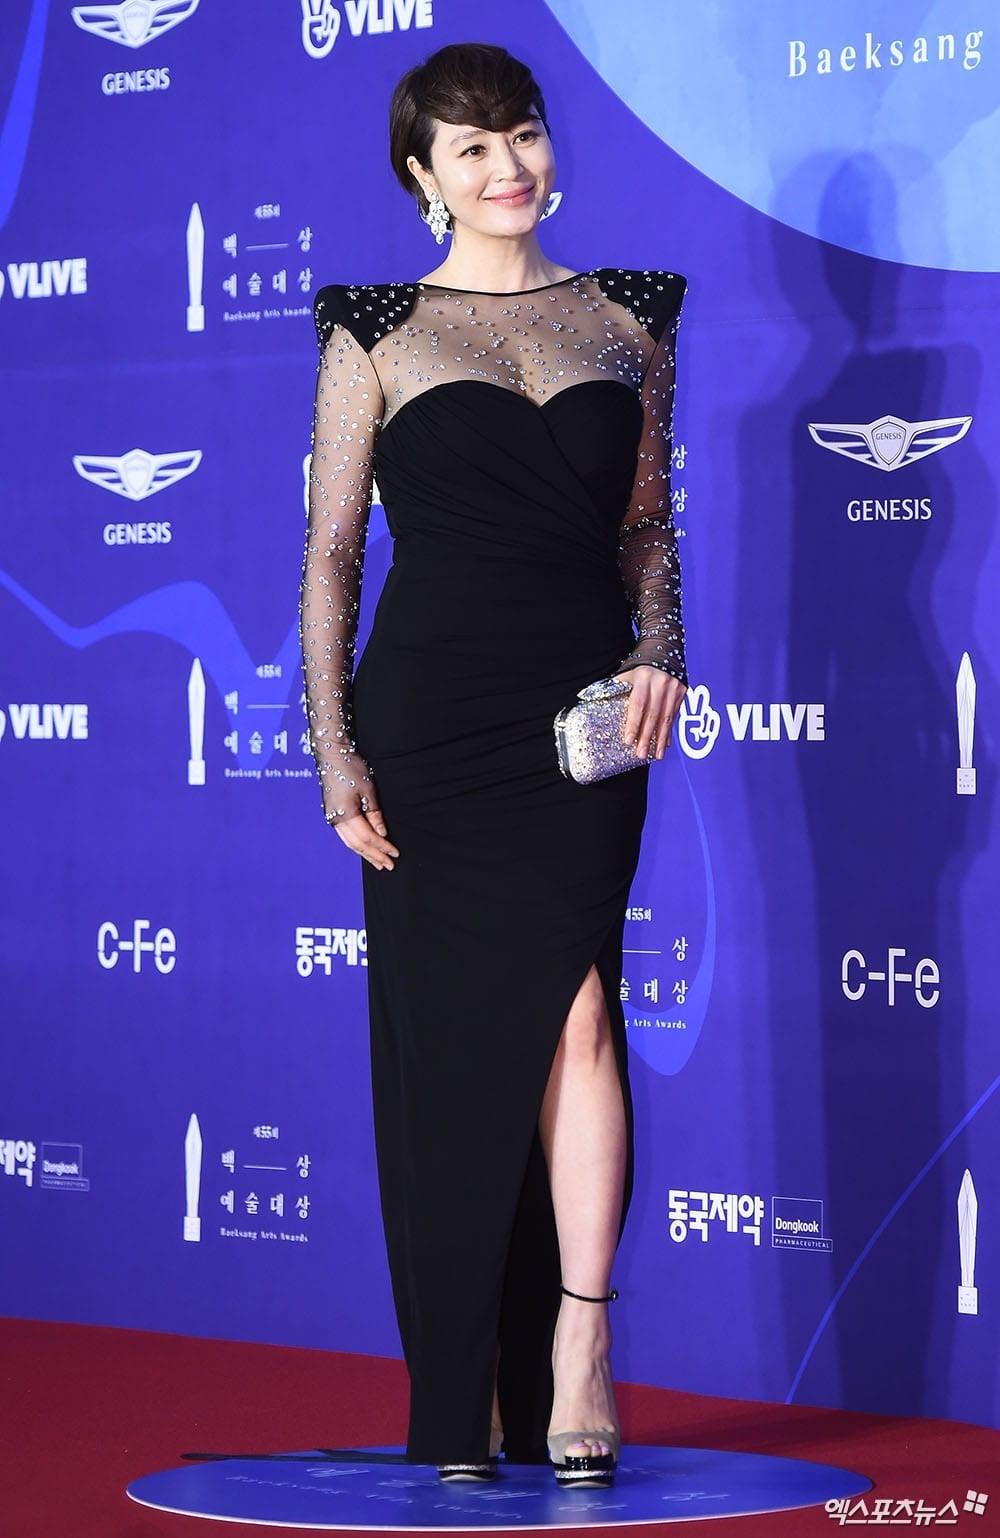 Sao Hàn,Suzy,Park Bo Gum,Lee Byung Hun,Jung Woo Sung,Kim Hyang Gi,Hyun Bin,Nam Joo Hyuk,Jang Ki Yong,Han Ji Min